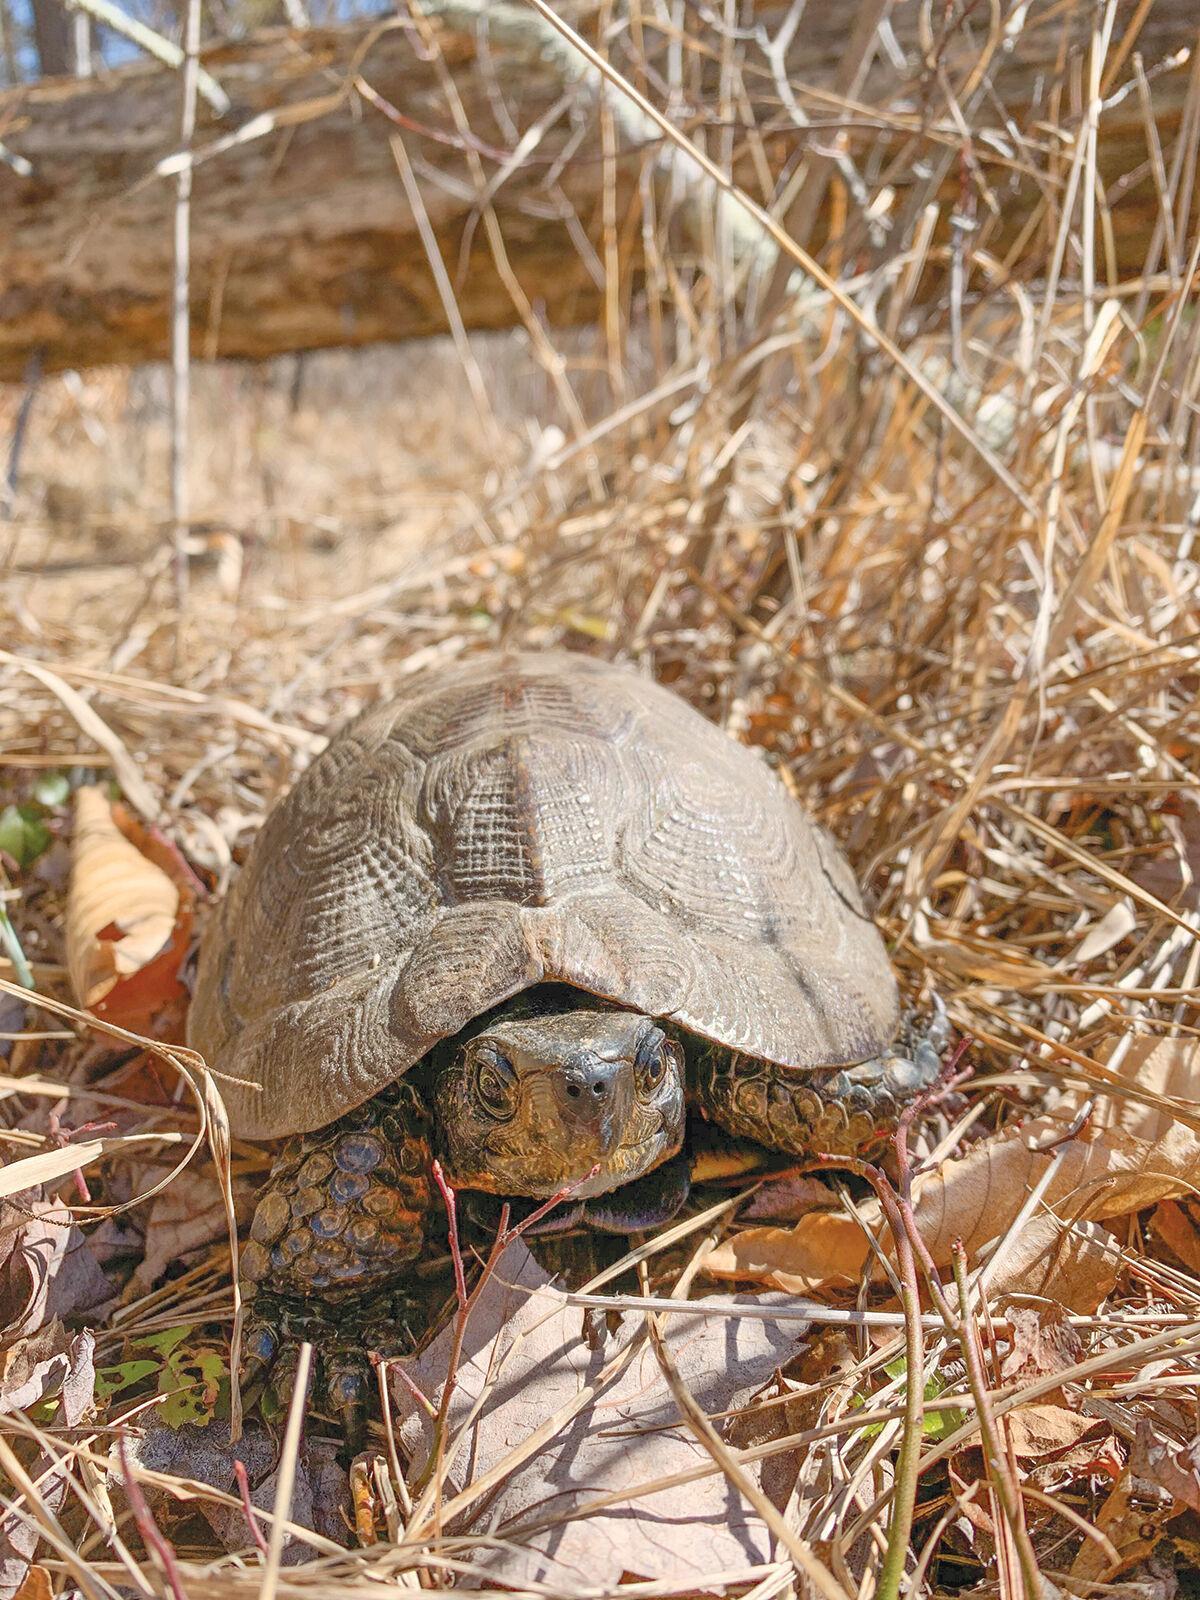 Native Vermont wild turtle